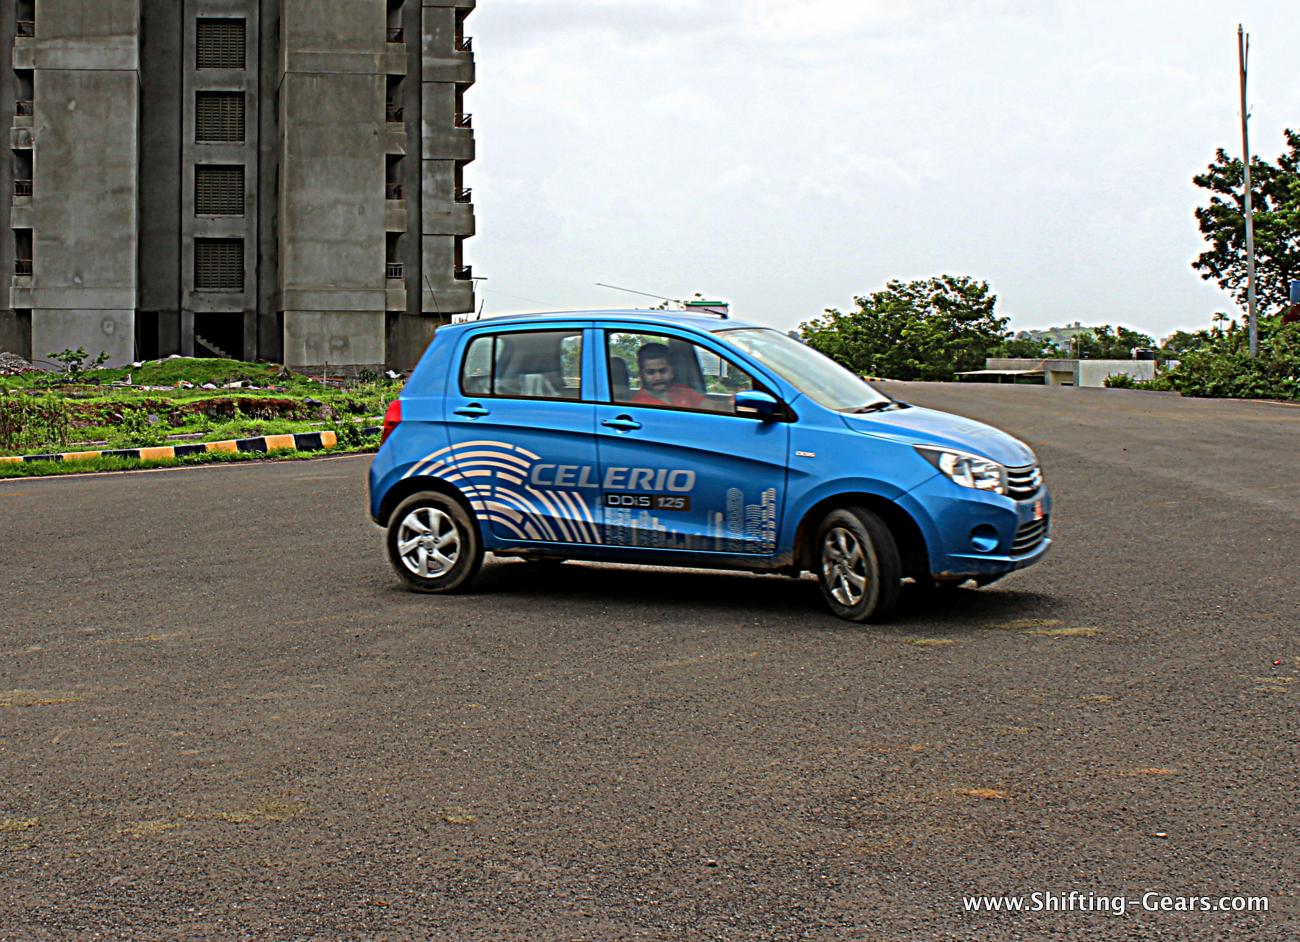 Maruti Suzuki Celerio Diesel: Review